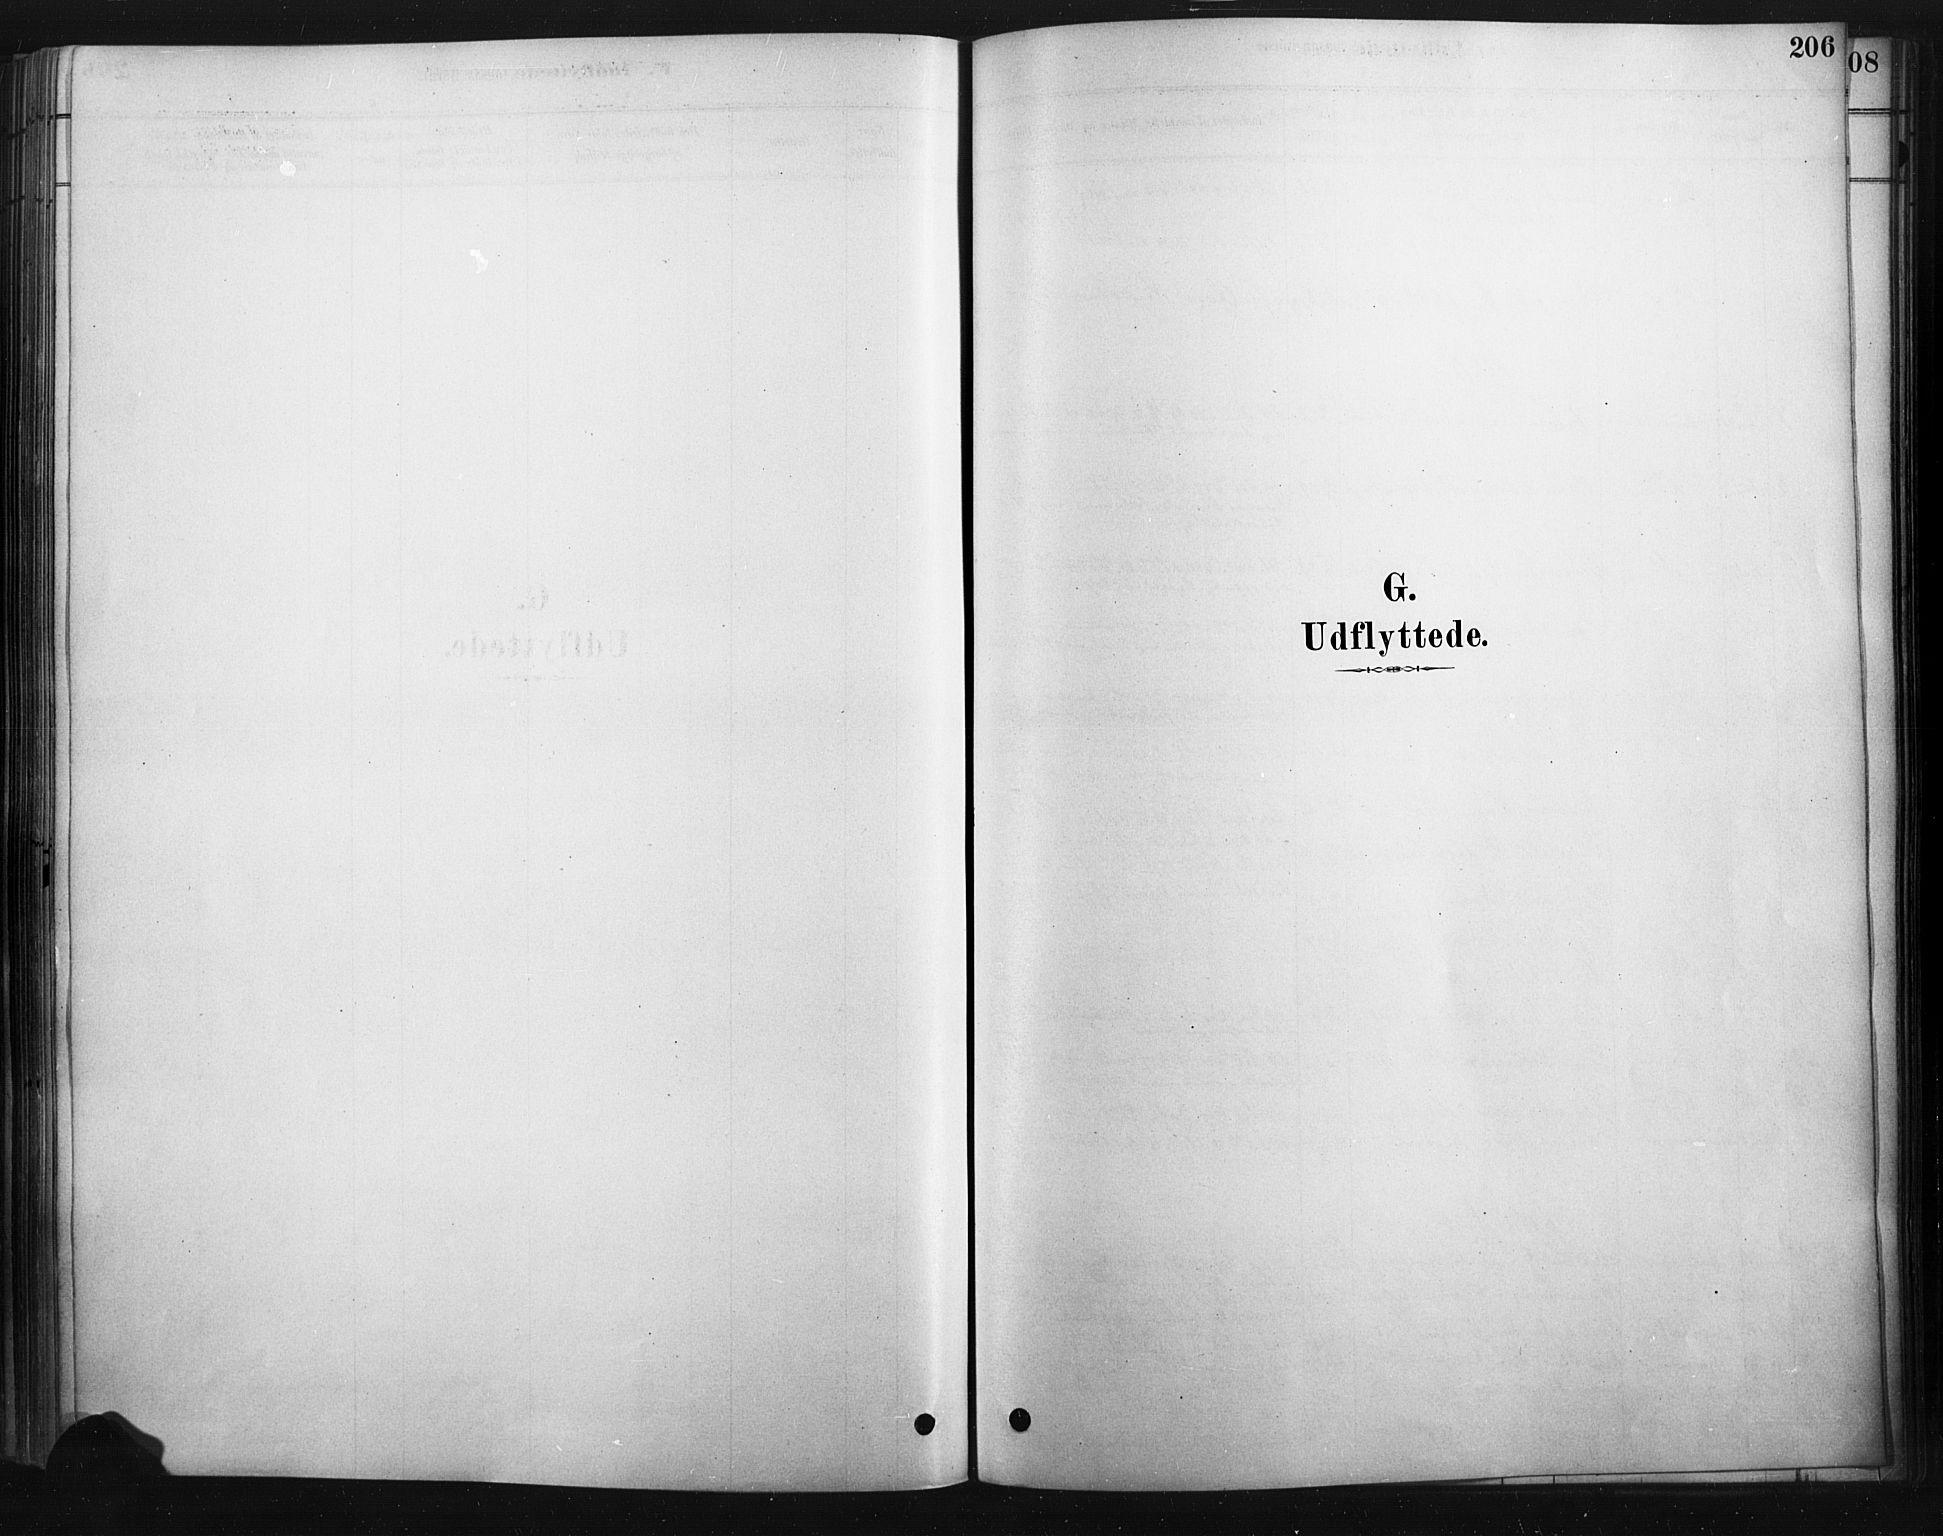 SAH, Rendalen prestekontor, H/Ha/Haa/L0010: Ministerialbok nr. 10, 1878-1901, s. 206